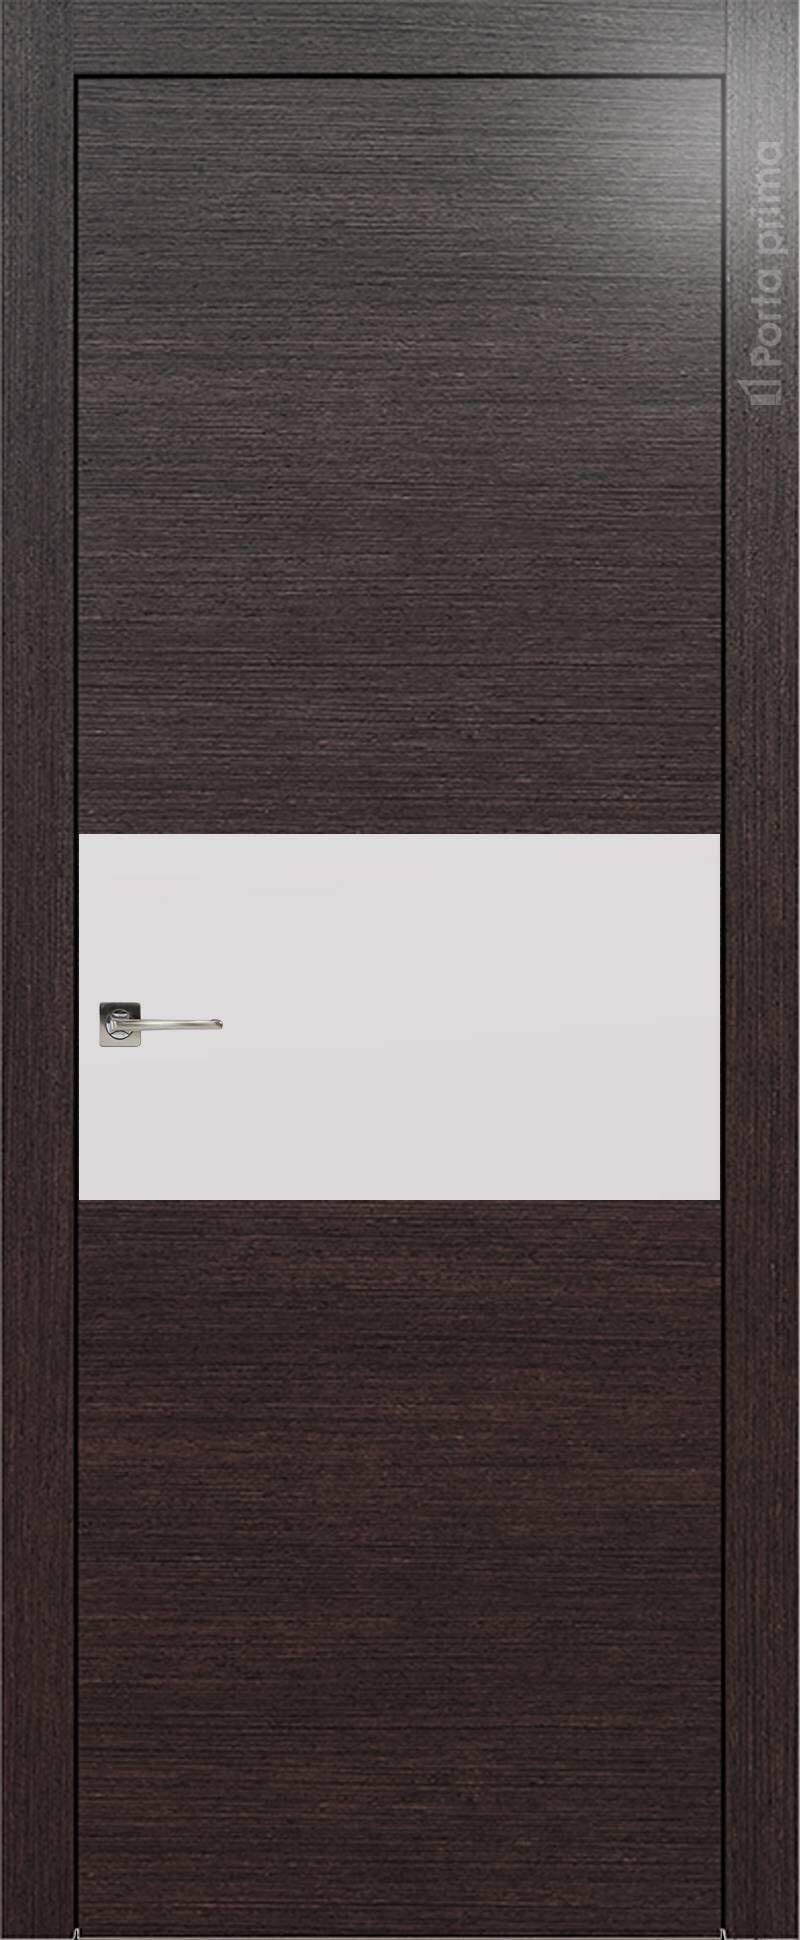 Tivoli Е-4 цвет - Венге Шоколад Без стекла (ДГ)